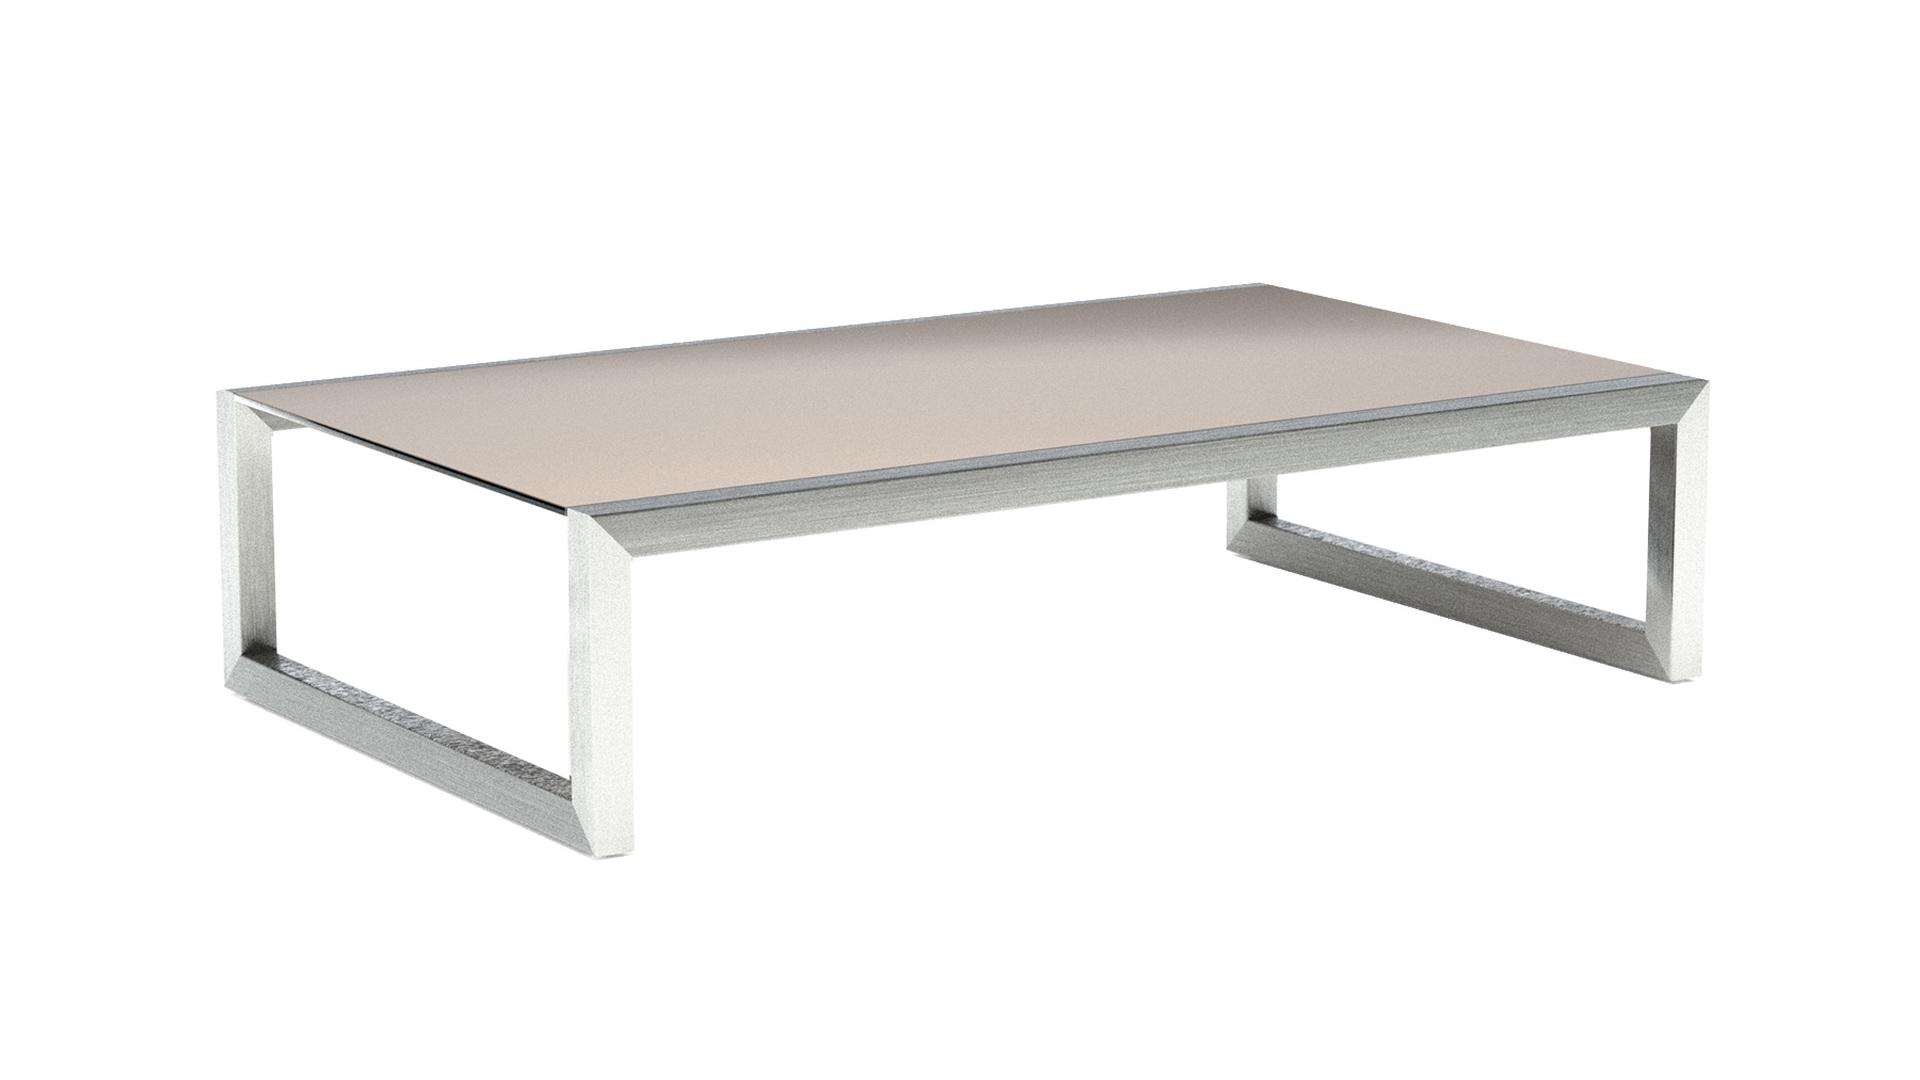 Ninix 150t low table royal botania rvs-clu.jpg